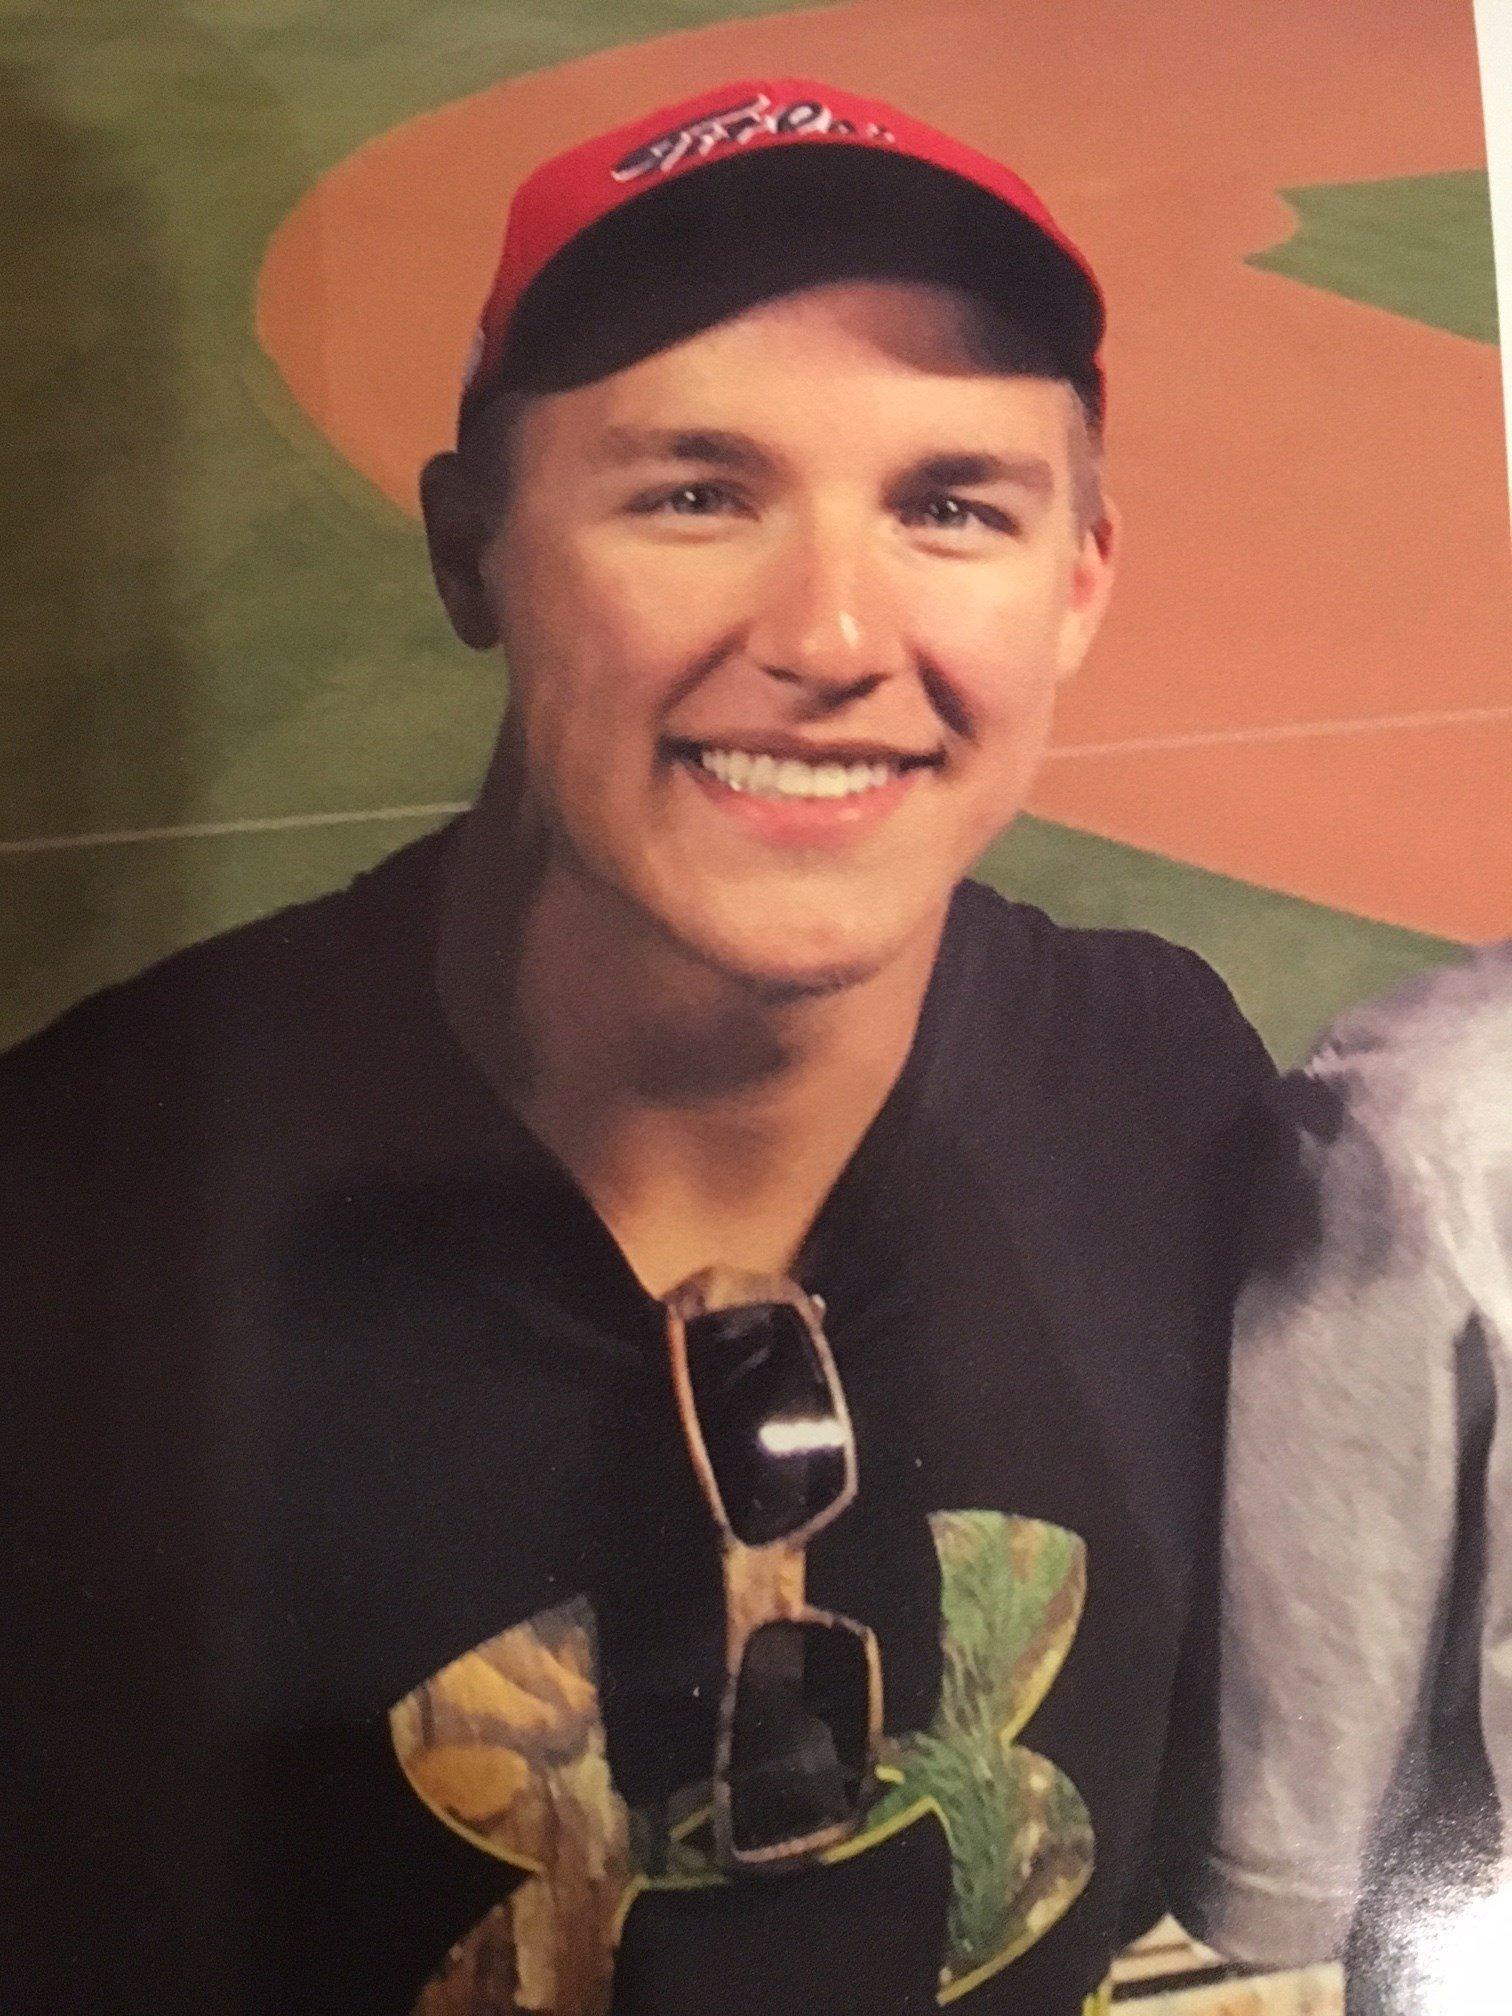 Joe Smith was killed in a car crash last June. (Source: Smith Family)